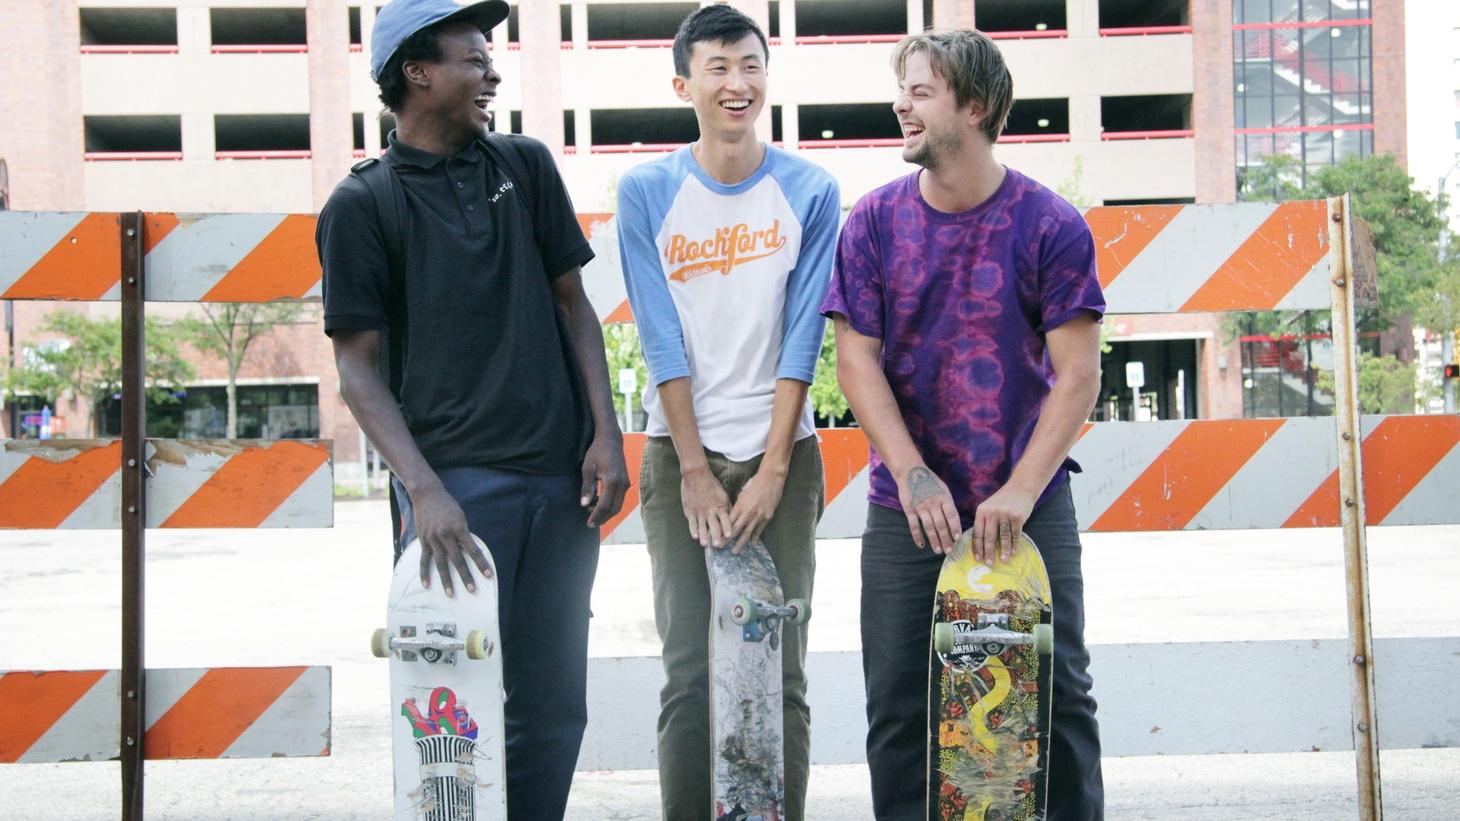 Keire Johnson, Bing Liu, and Zack Mulligan in a still from Bing Liu's MINDING THE GAP.